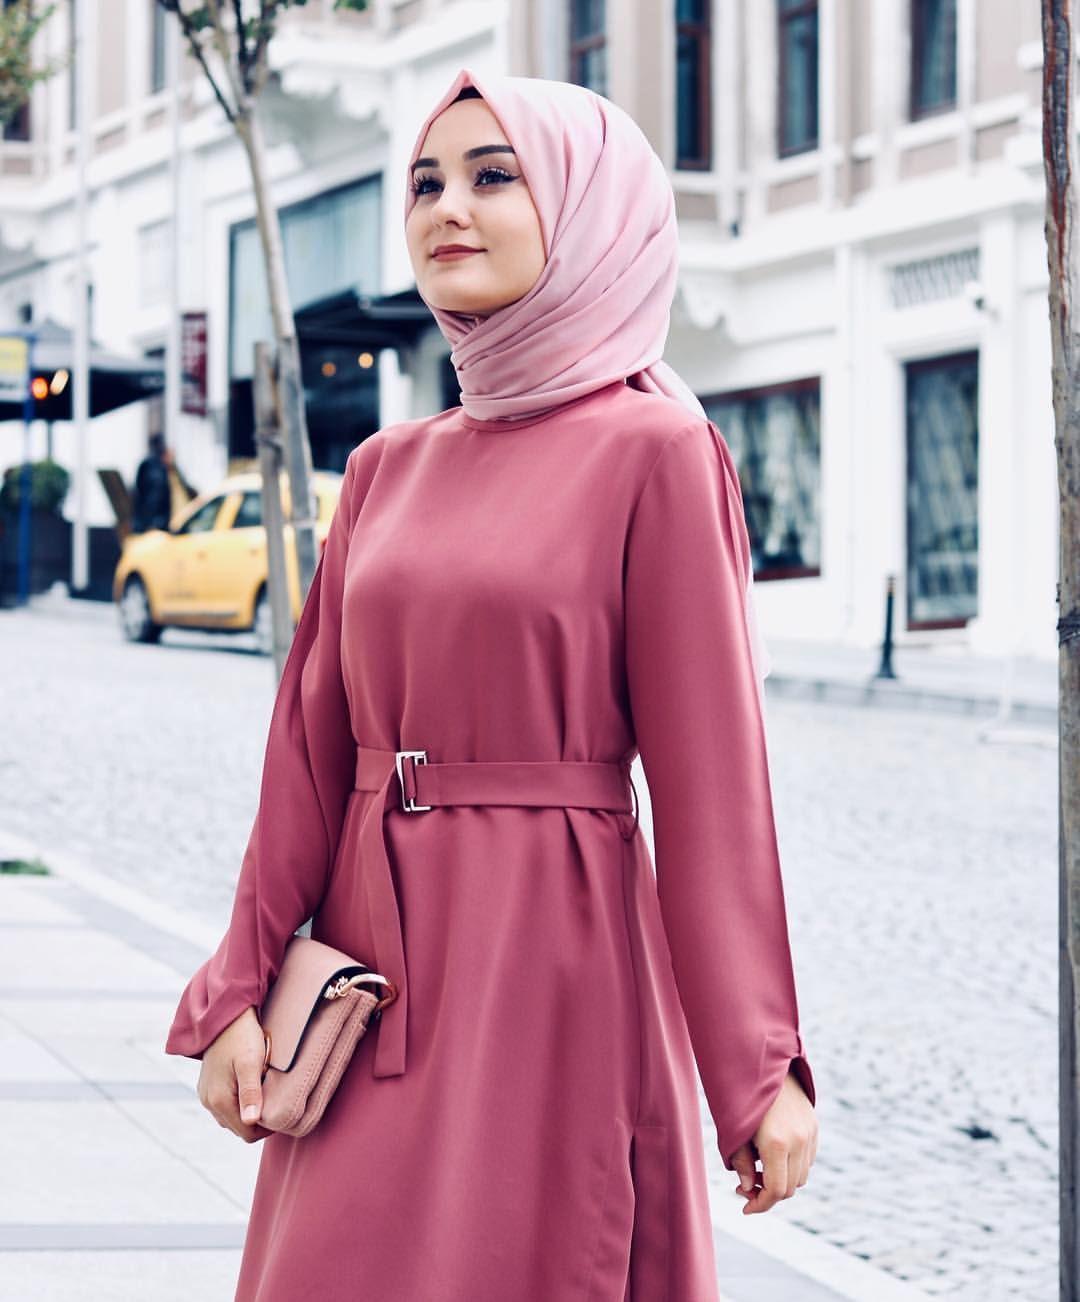 67e4b52d168a6 6,771 Beğenme, 53 Yorum - Instagram'da Aleyna ATALAR (@atalaraleyna):